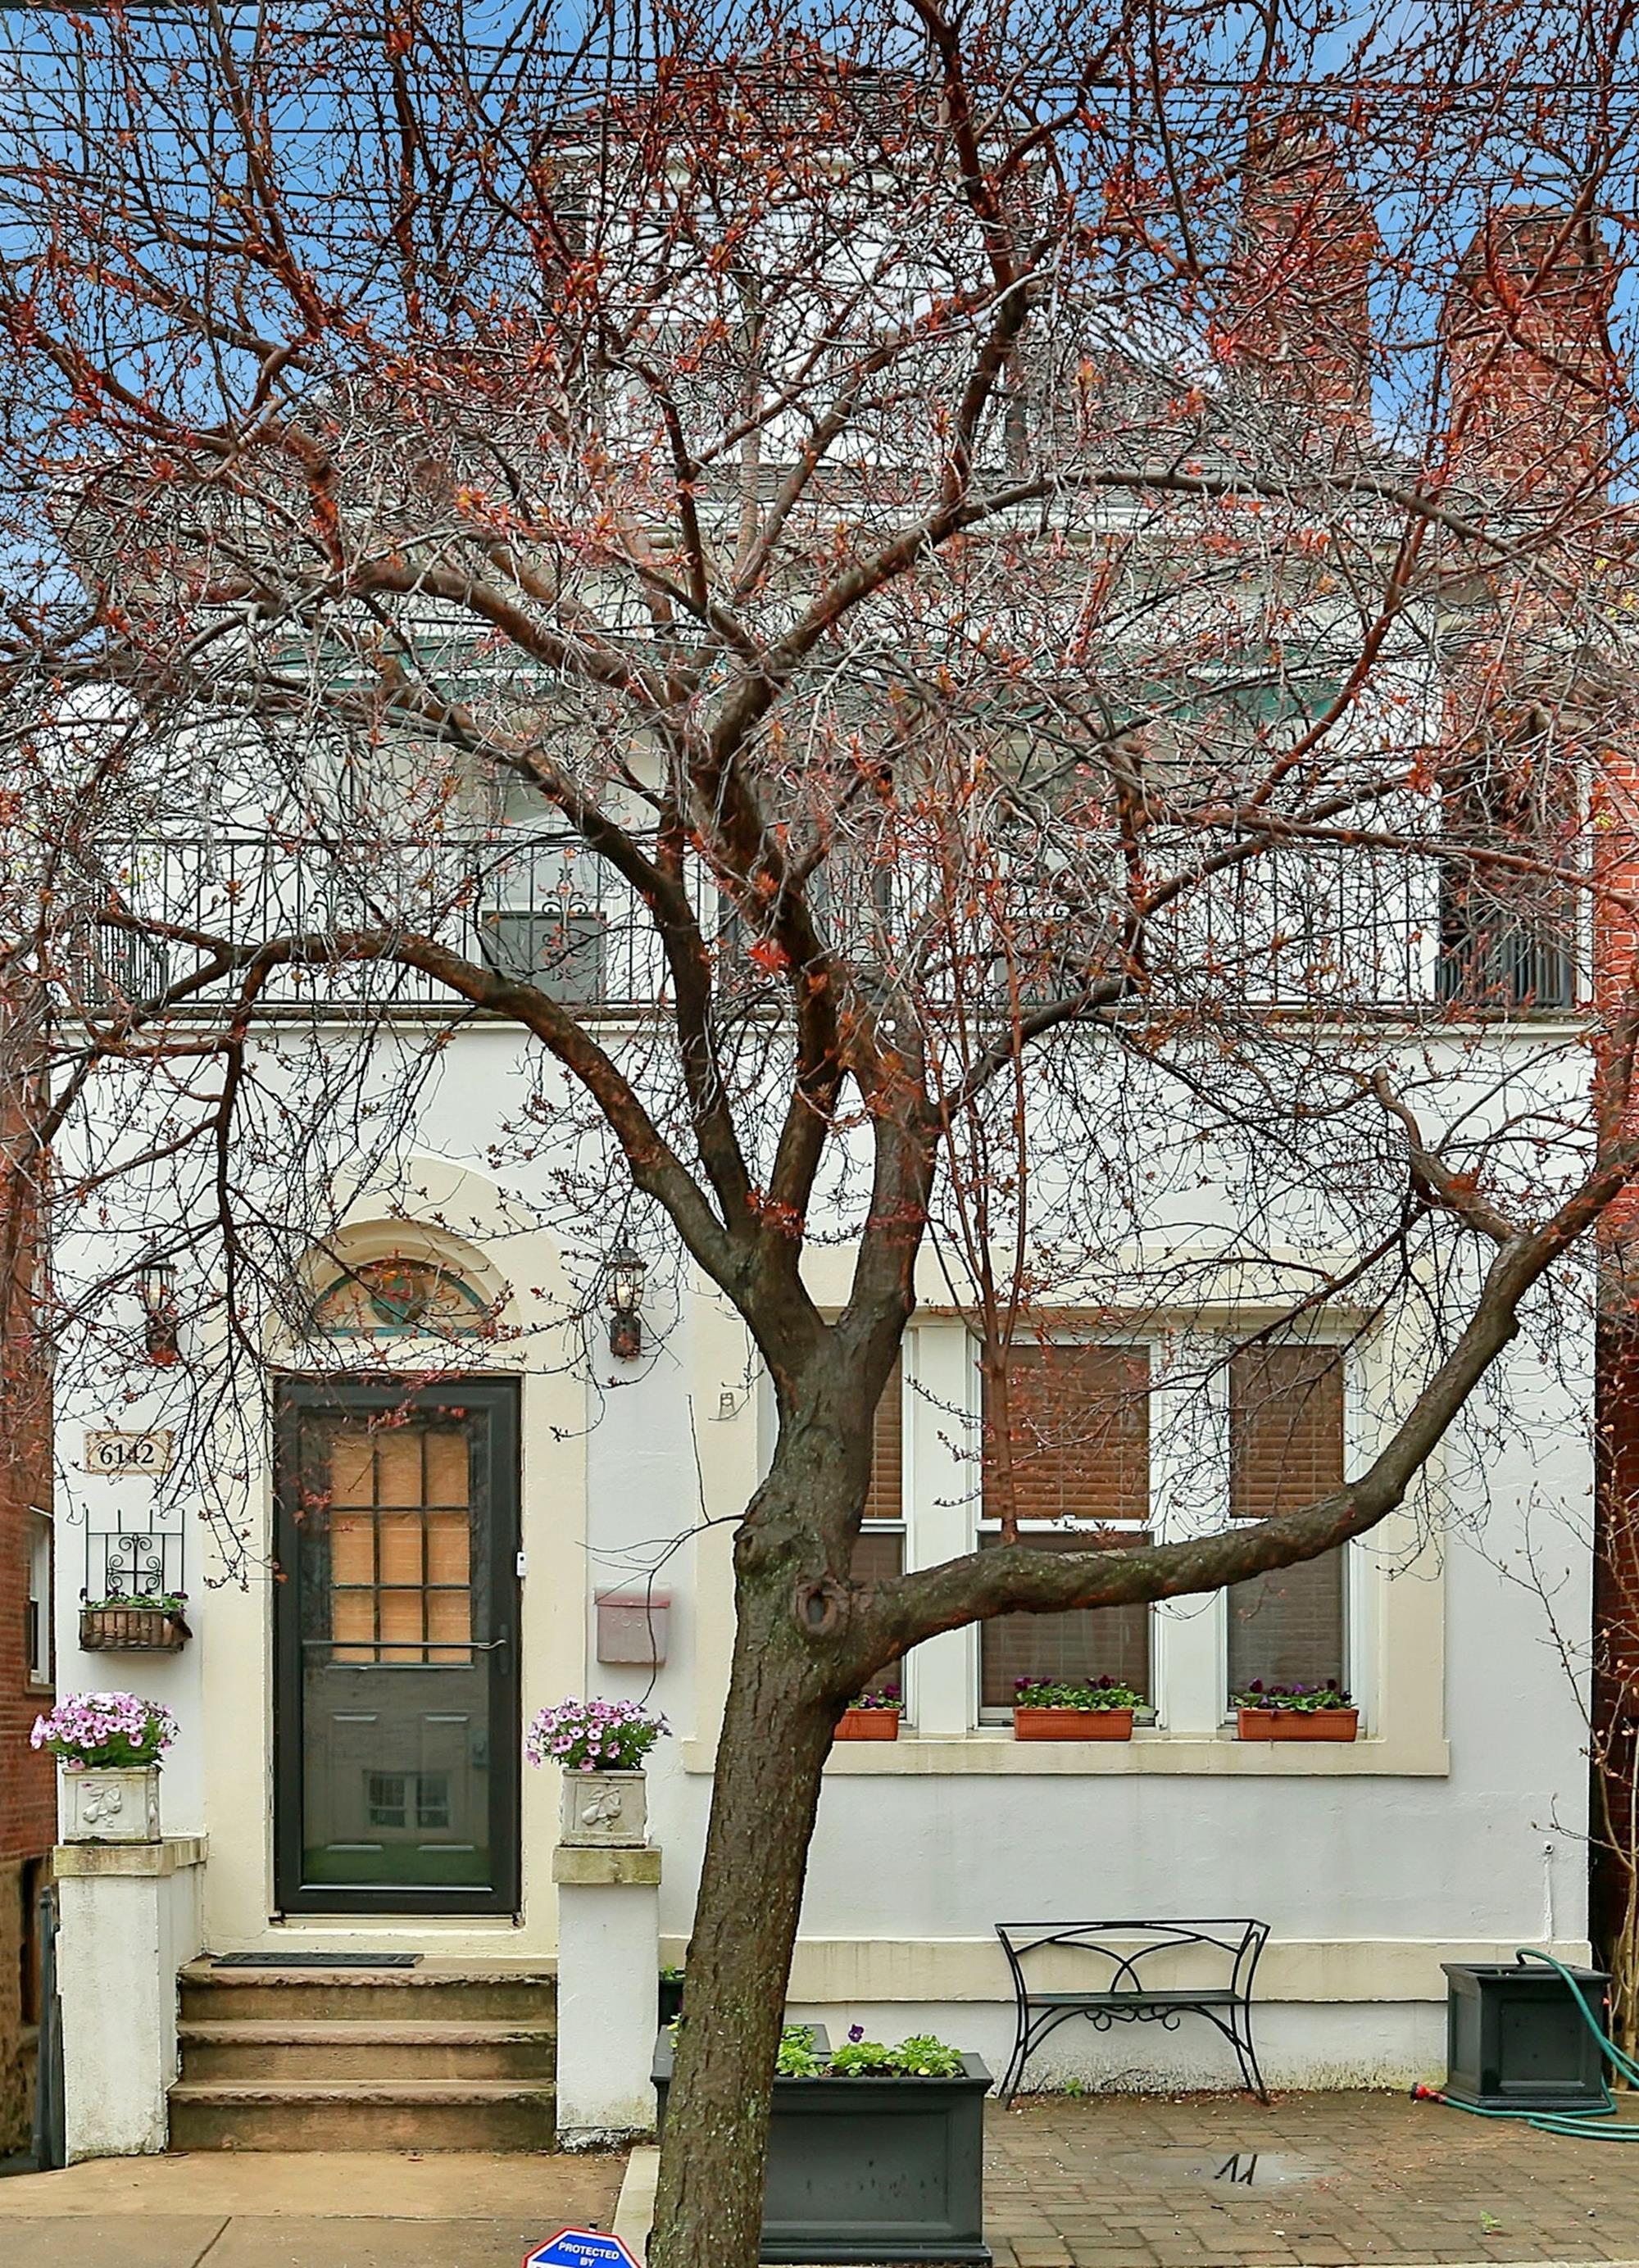 Renovated Picturesque 4-Bd. Brick & Stucco House w/ Decks, Patio & Yard